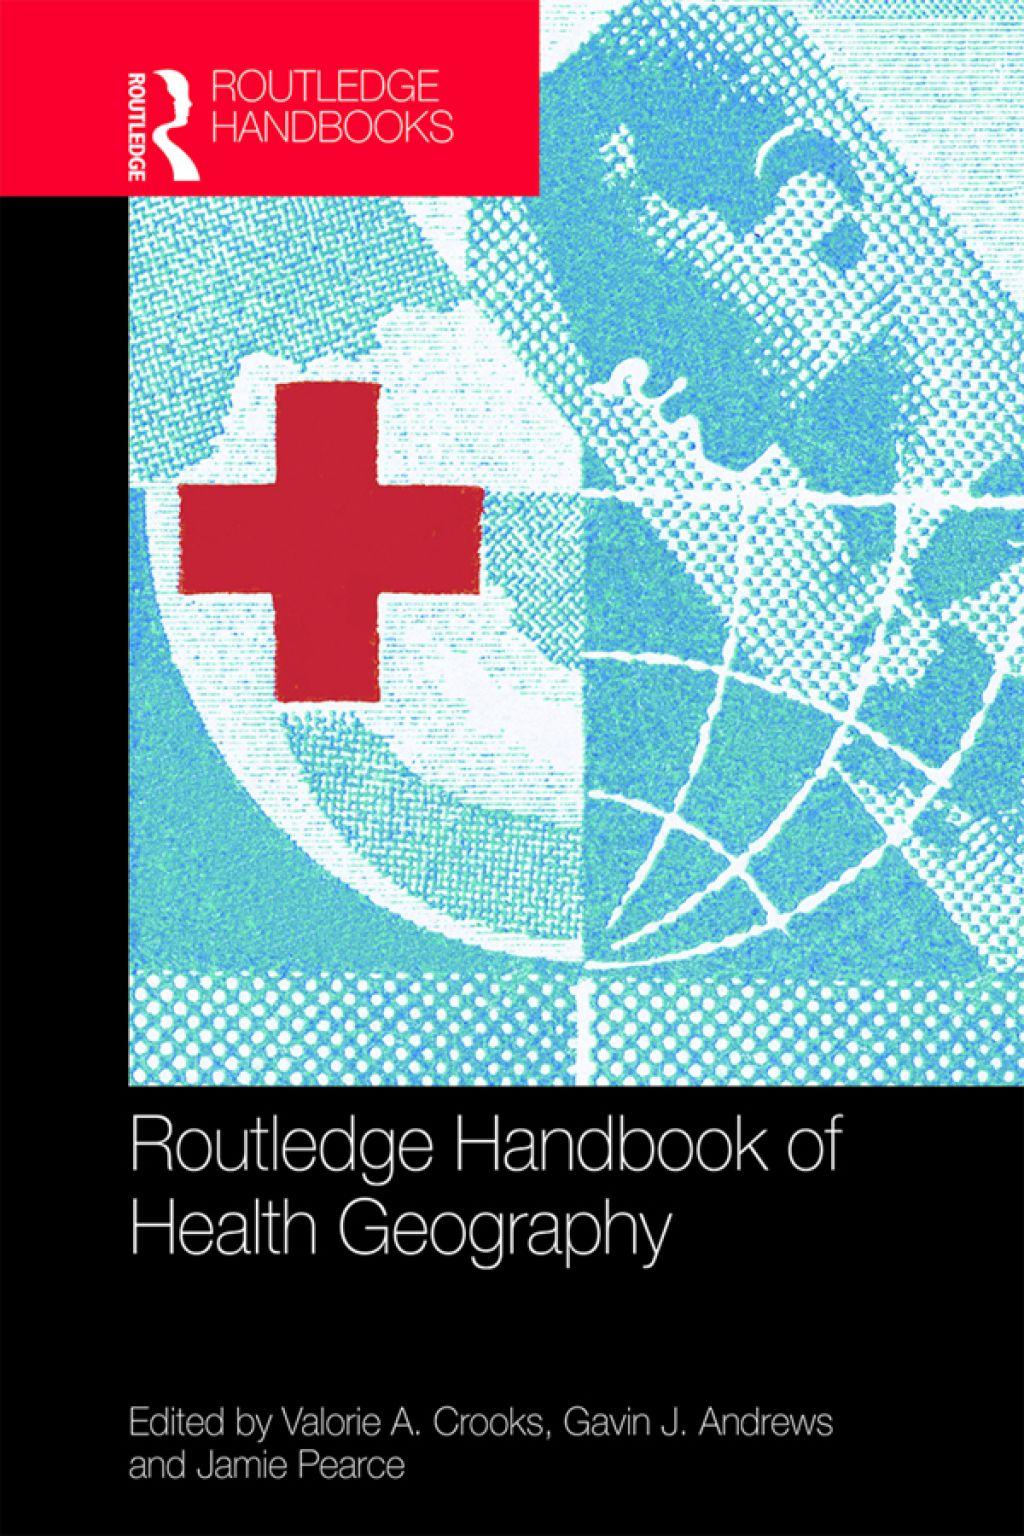 Routledge Handbook of Health Geography (eBook Rental